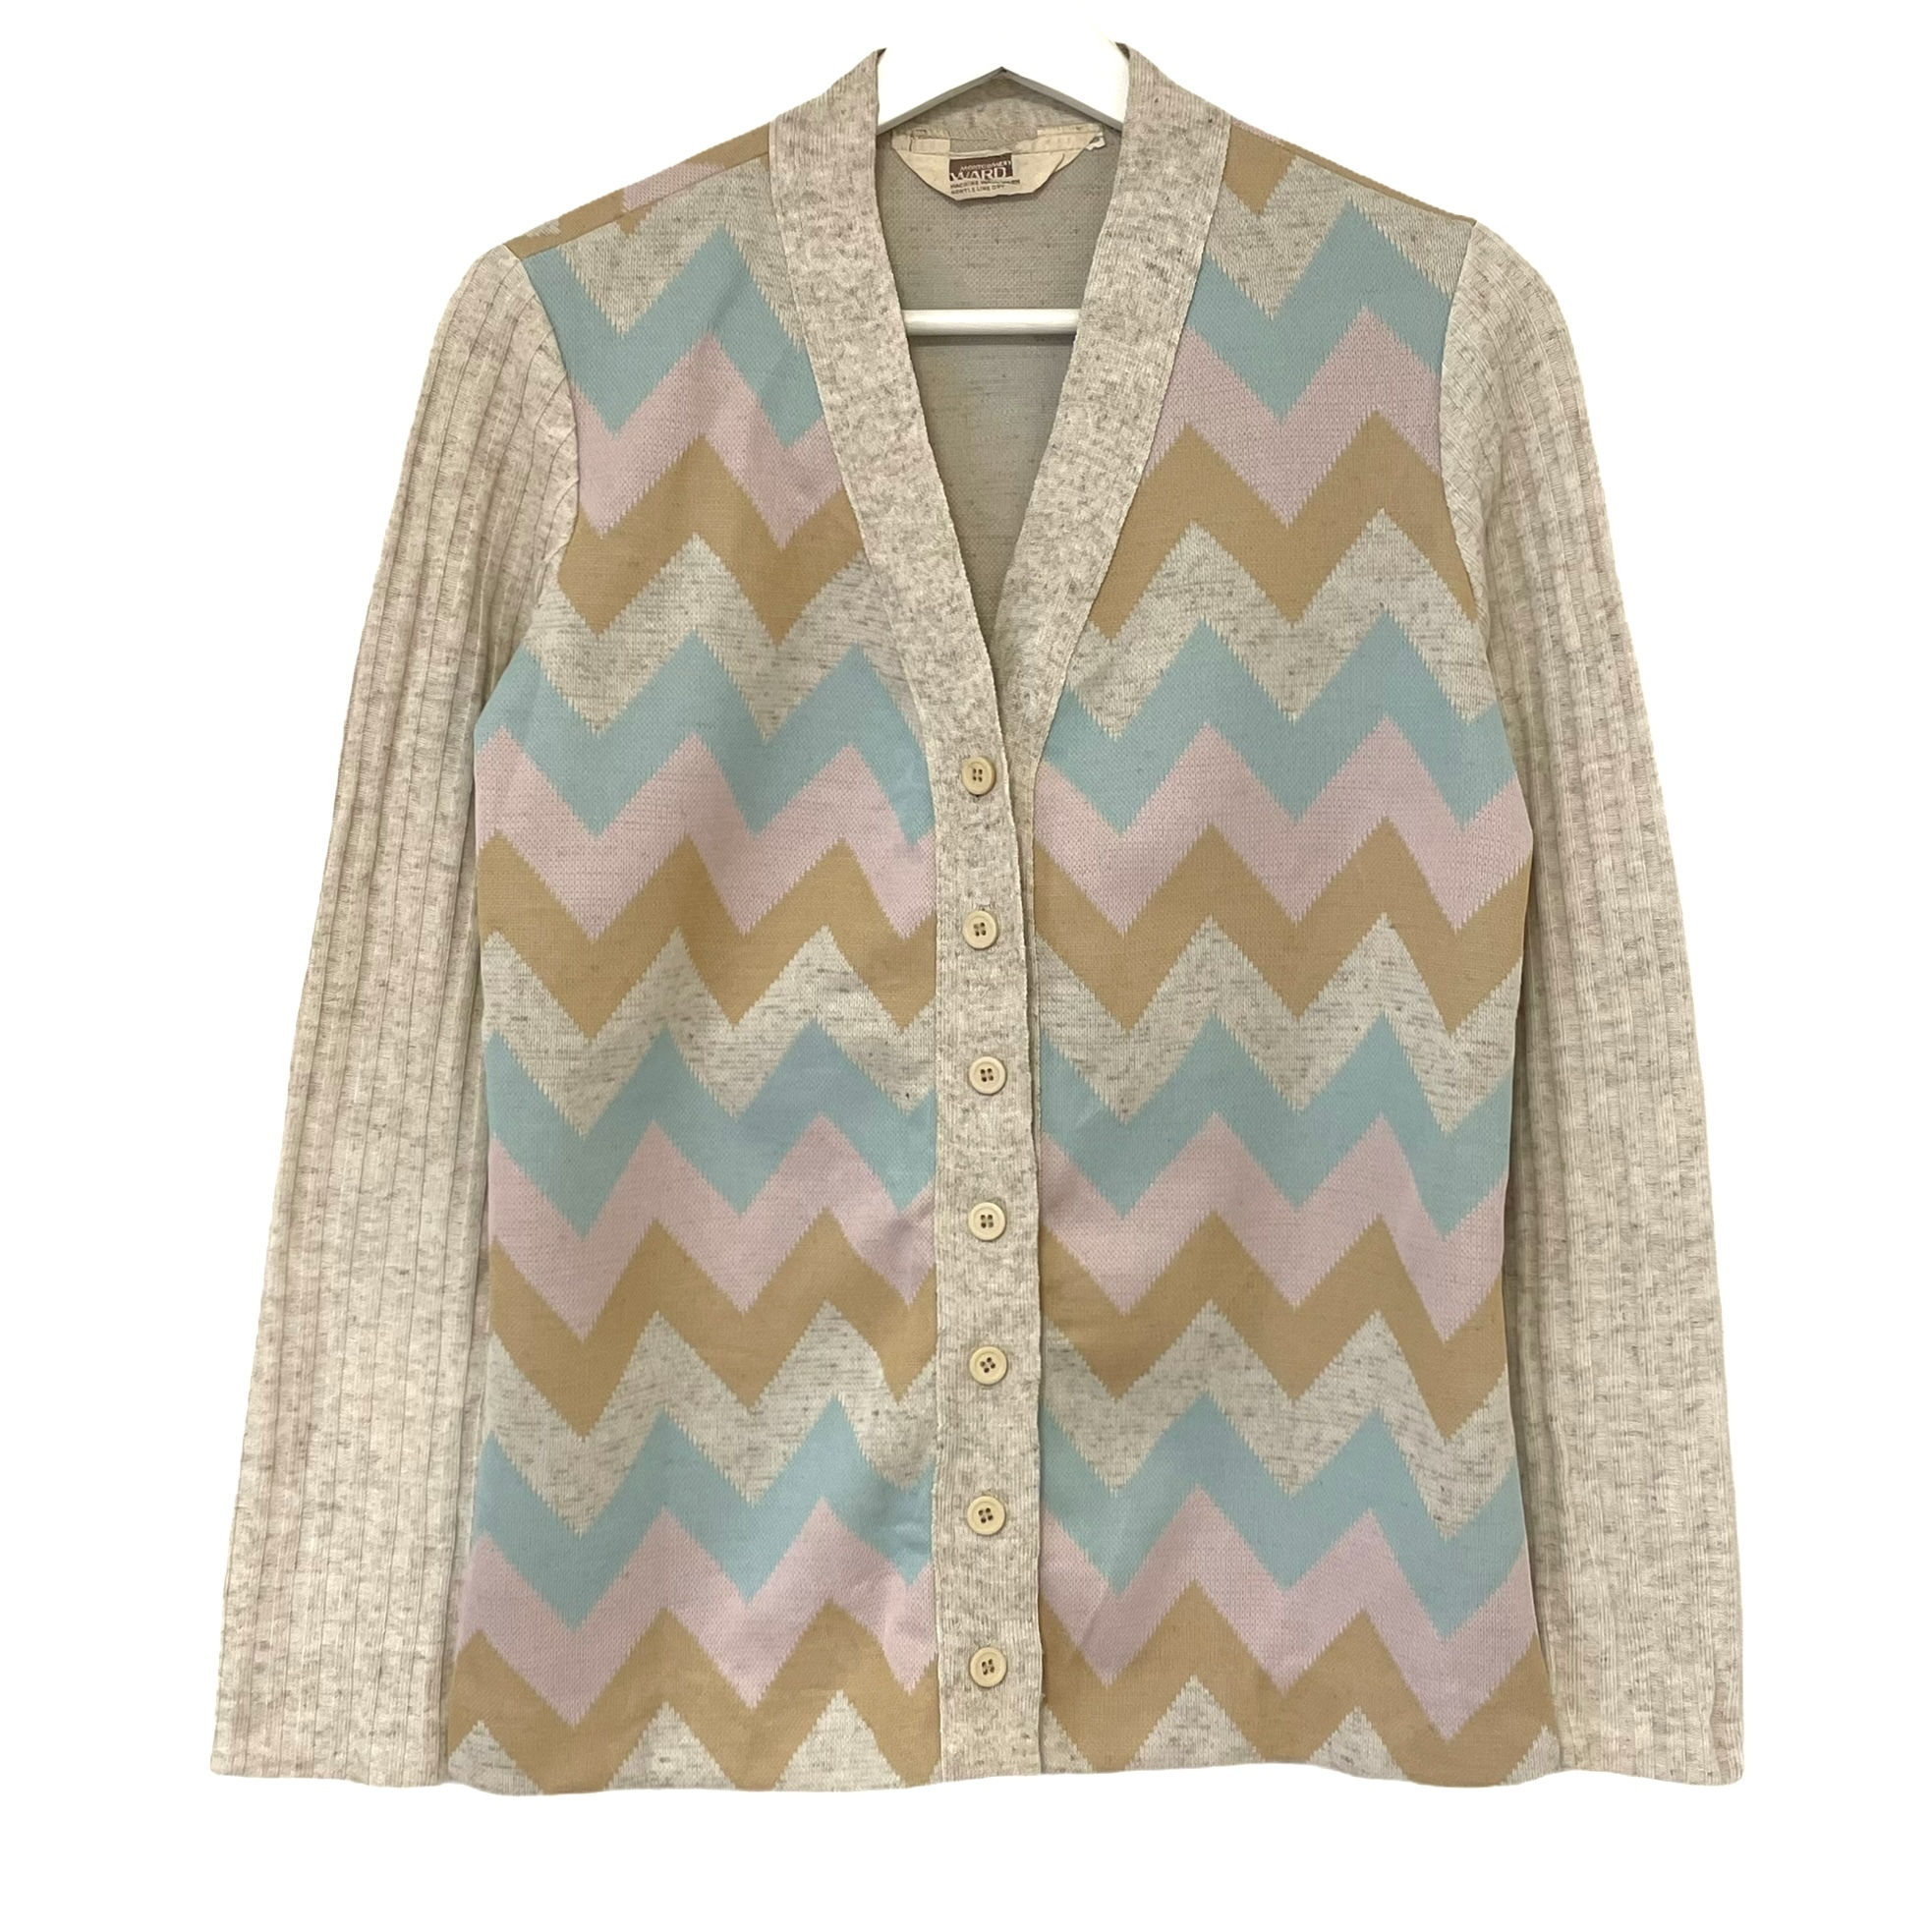 70's MONGOMERY WARD Zigzag Pattern Summer Knit Cardigan